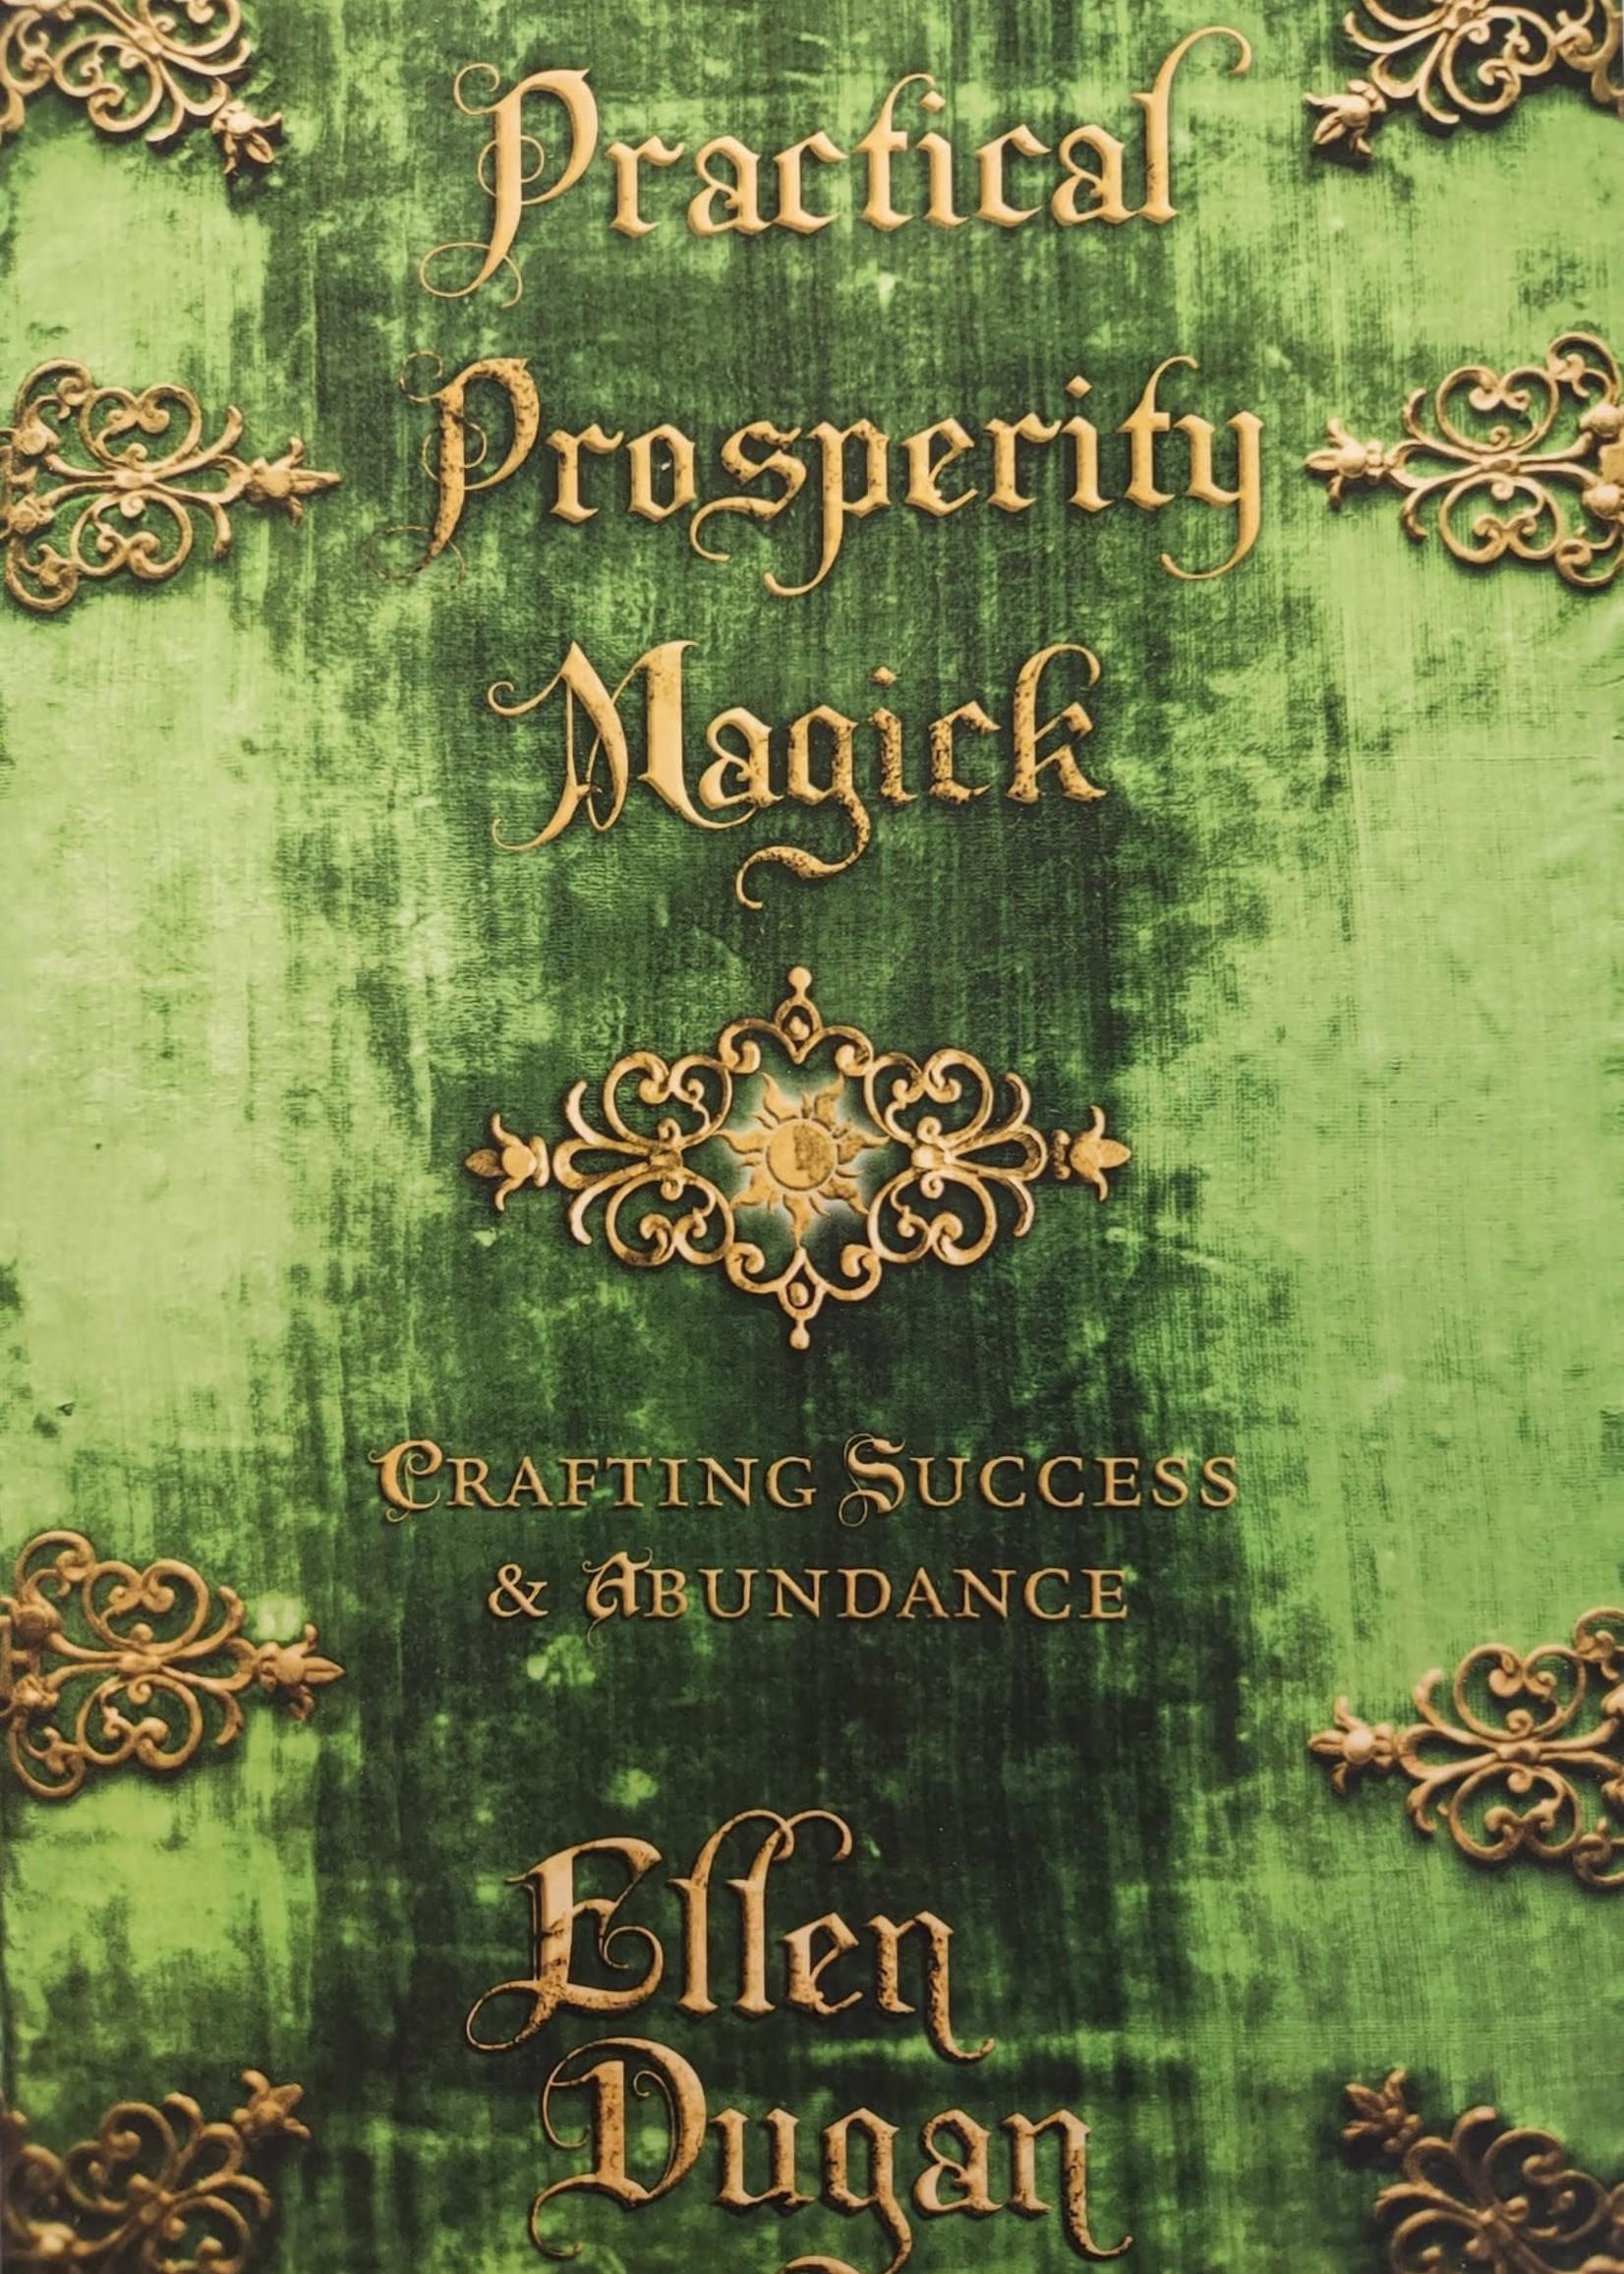 Practical Prosperity Magick - BY ELLEN DUGAN